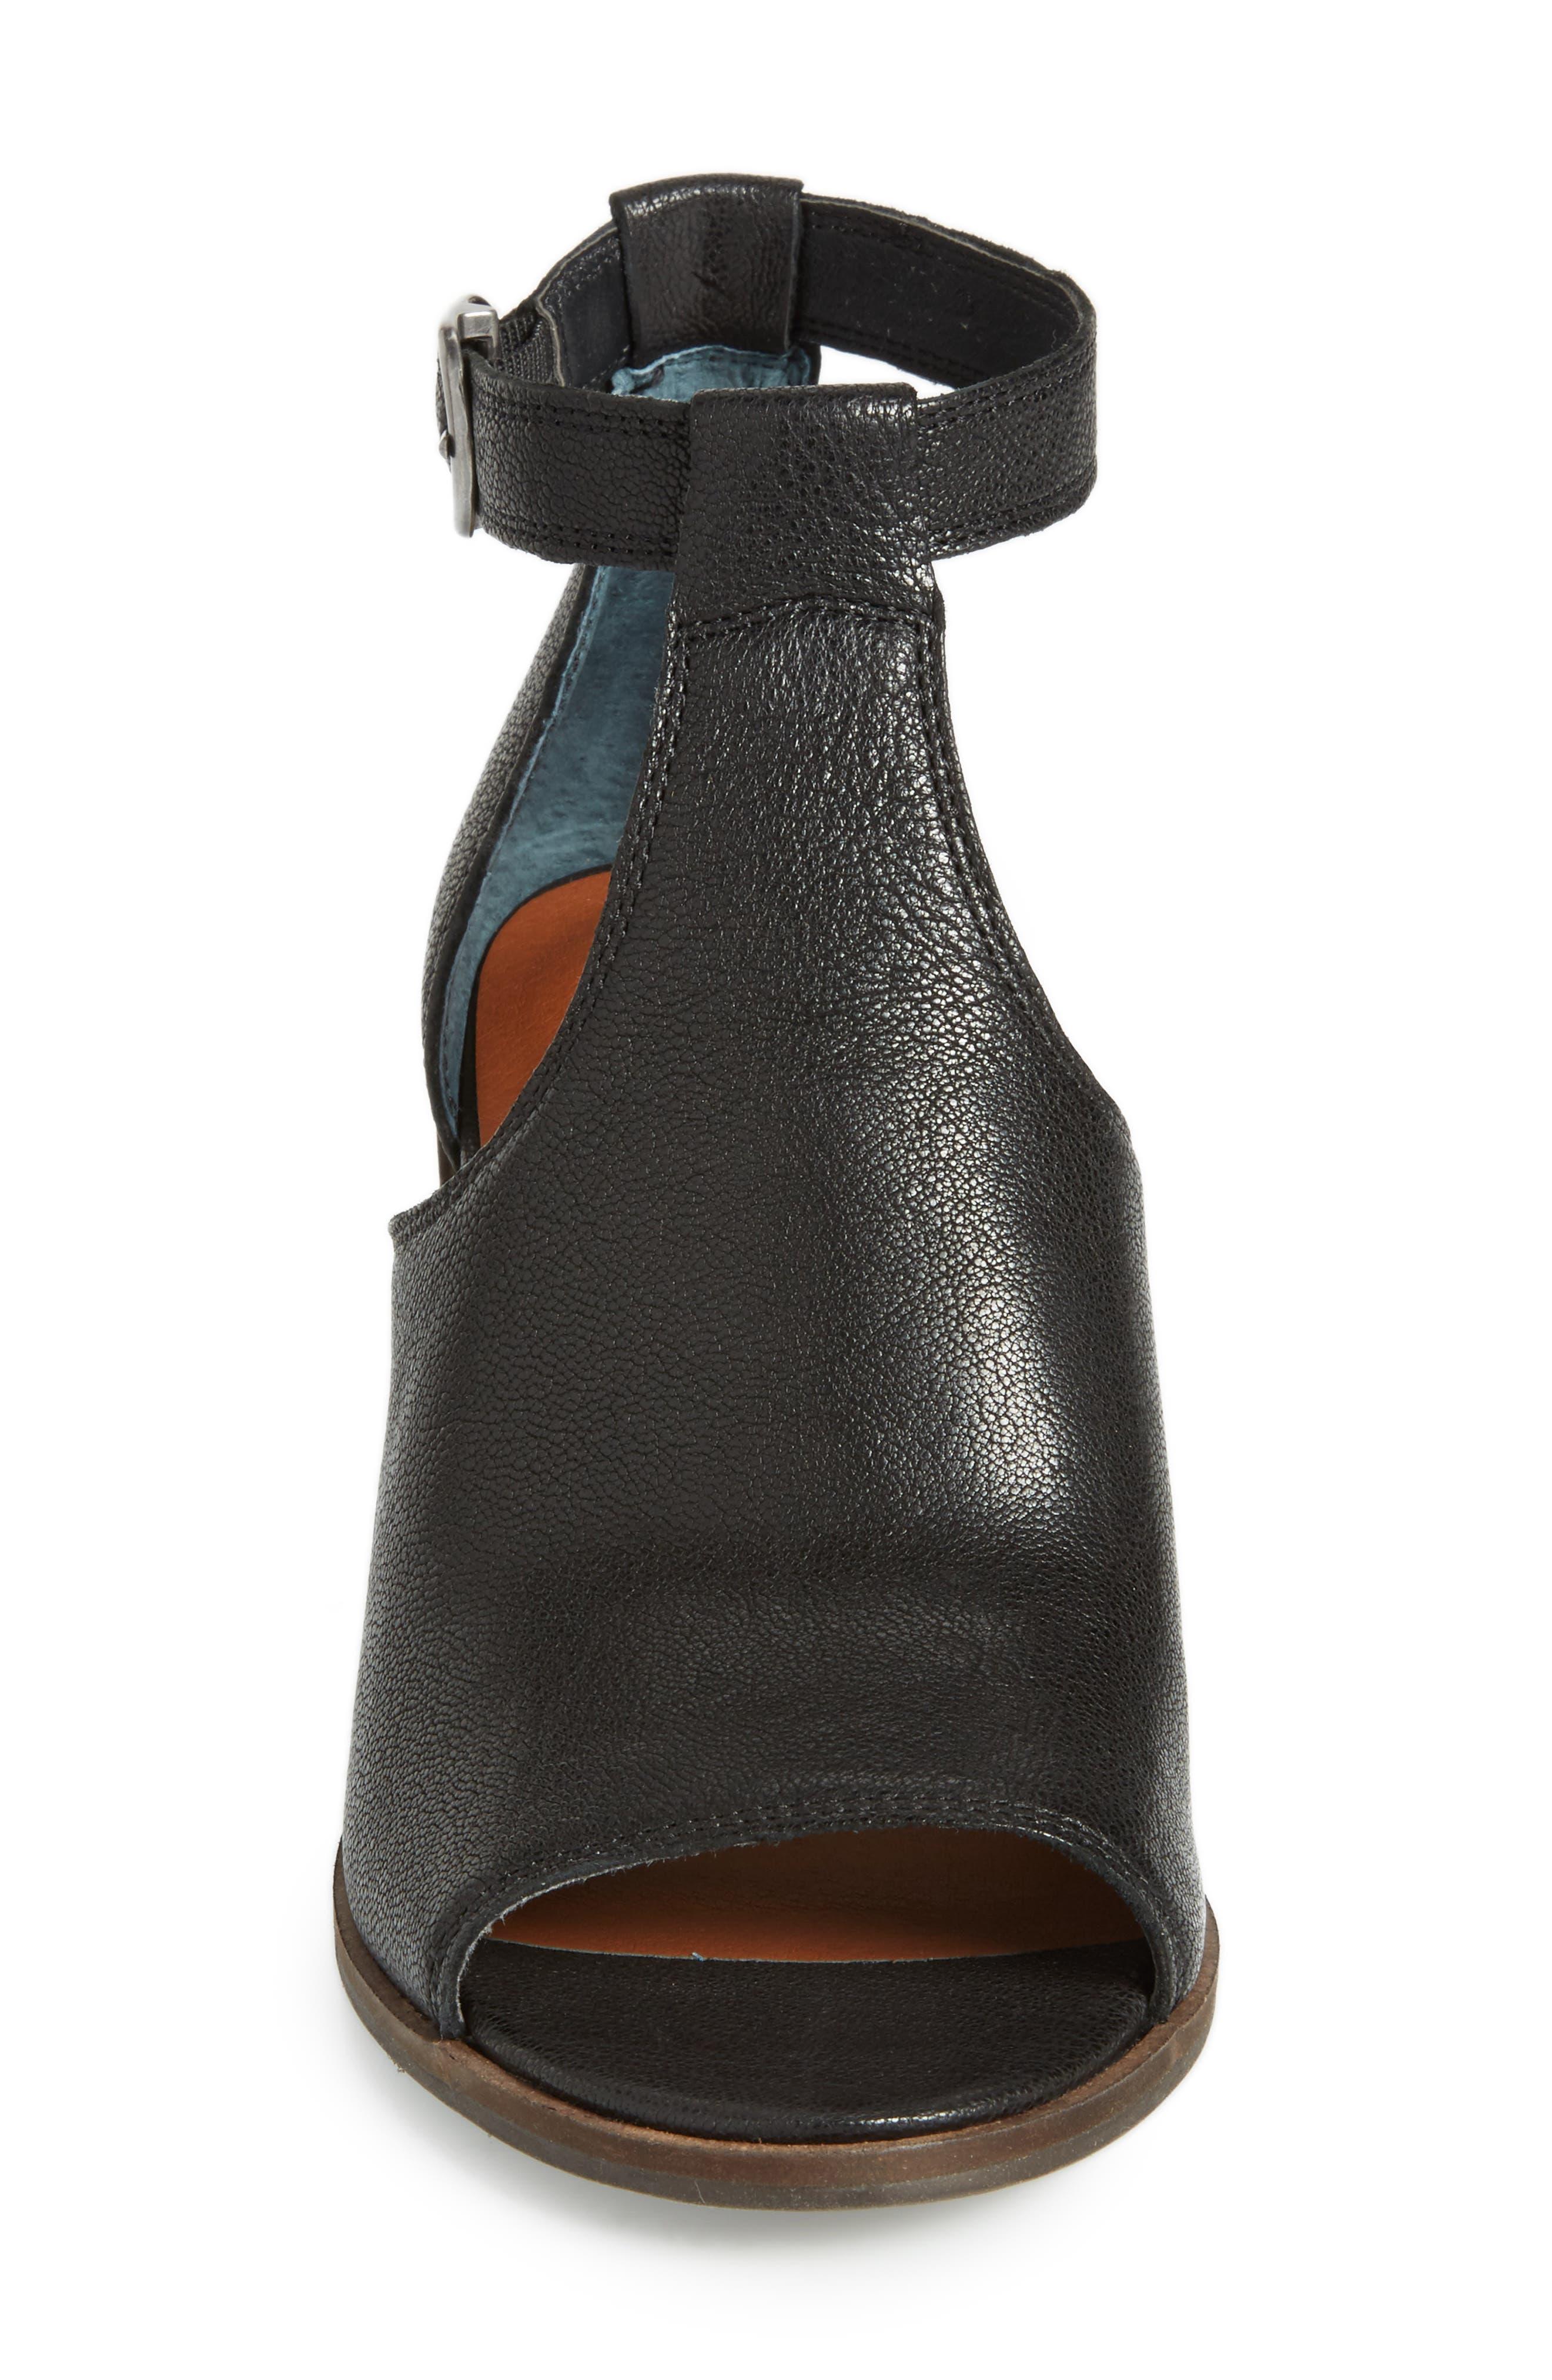 Kadian Block Heel Sandal,                             Alternate thumbnail 4, color,                             Black Leather